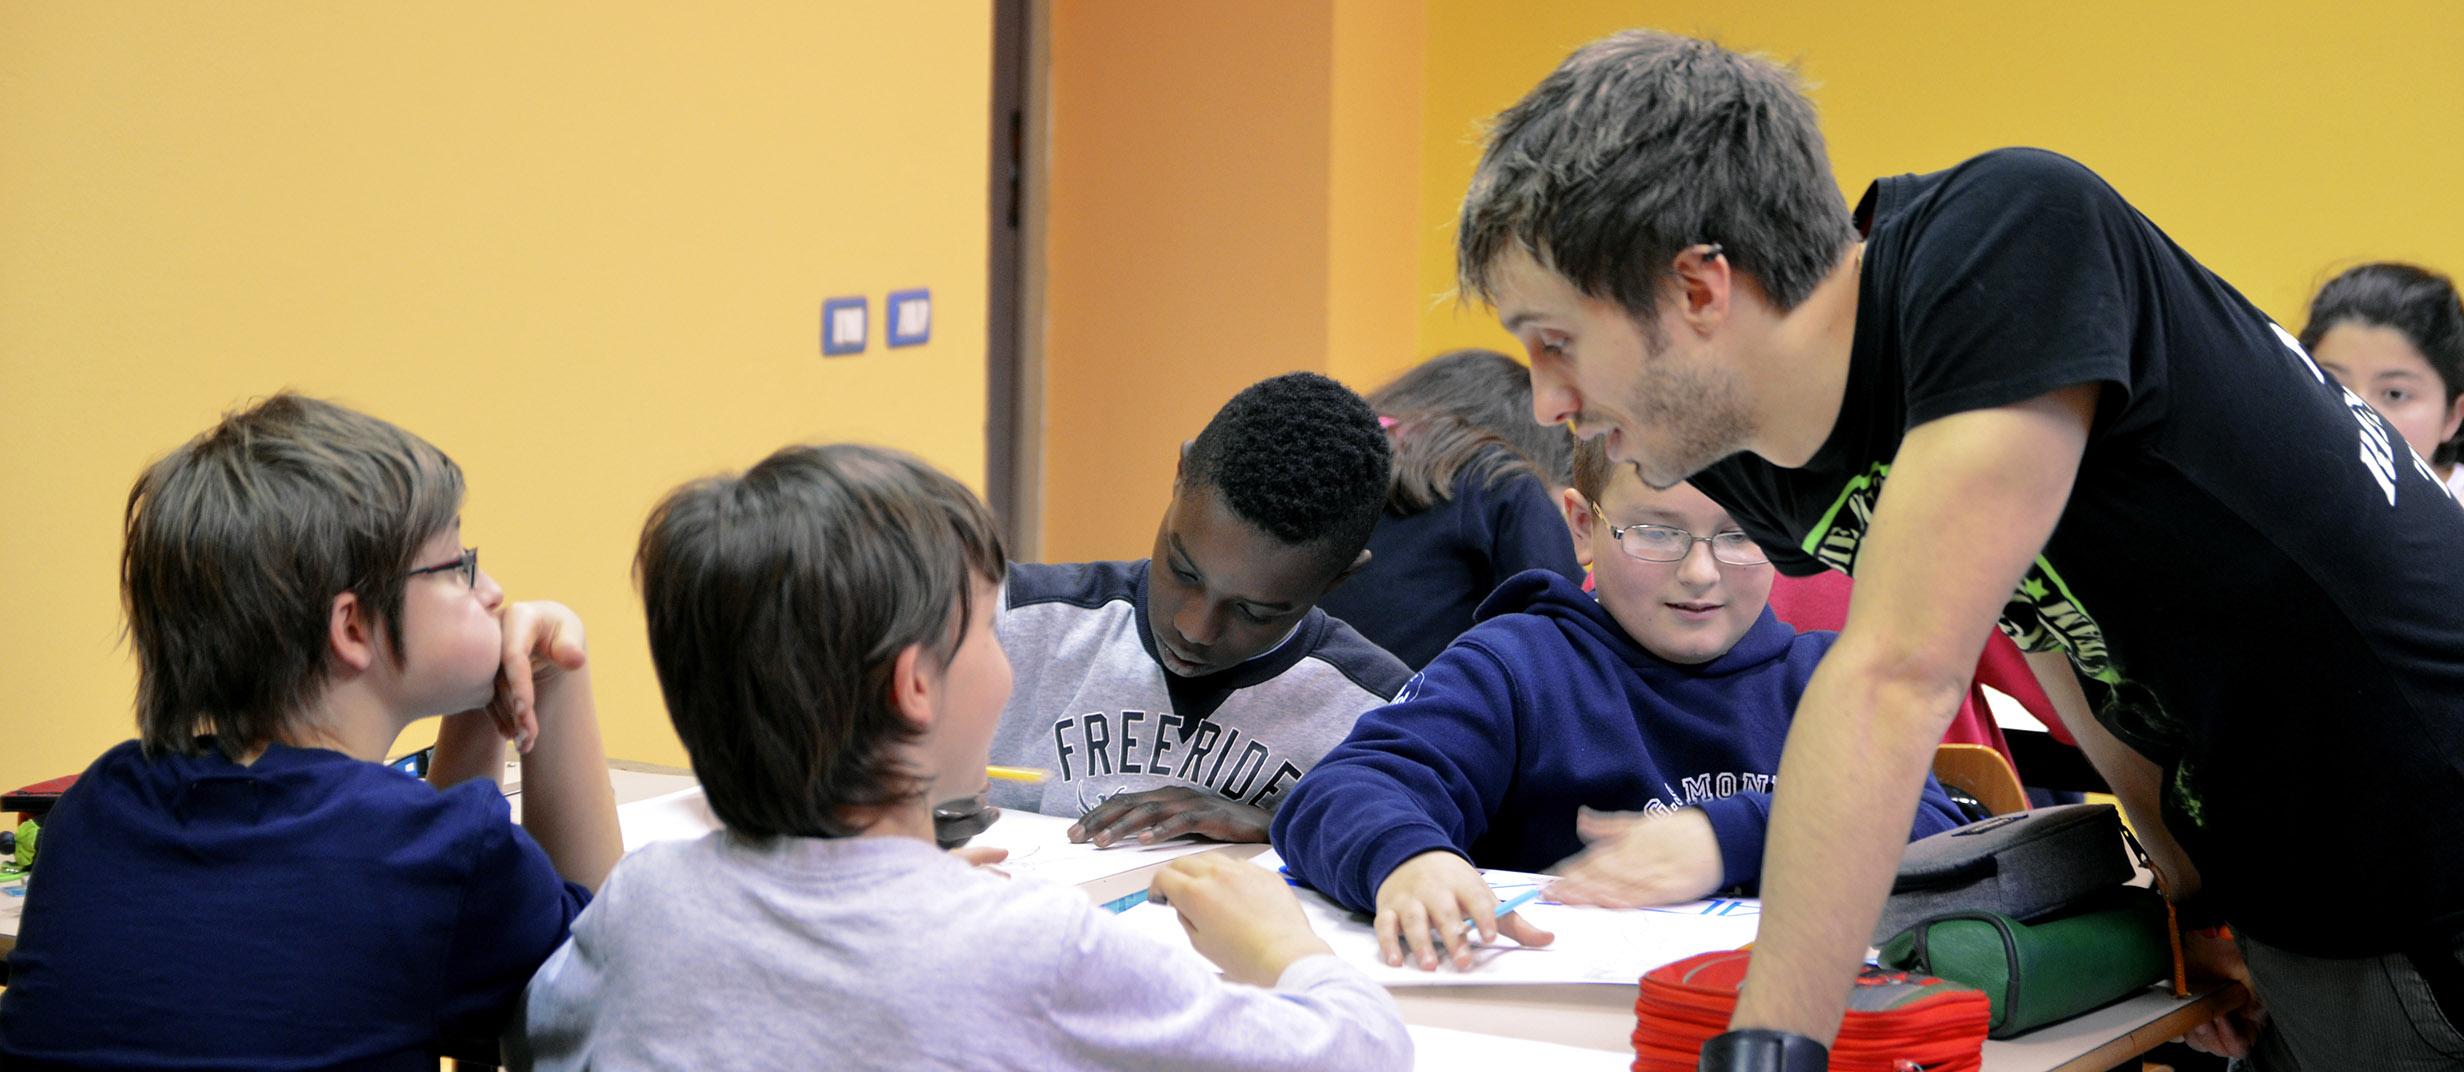 workshop ragazzi 3